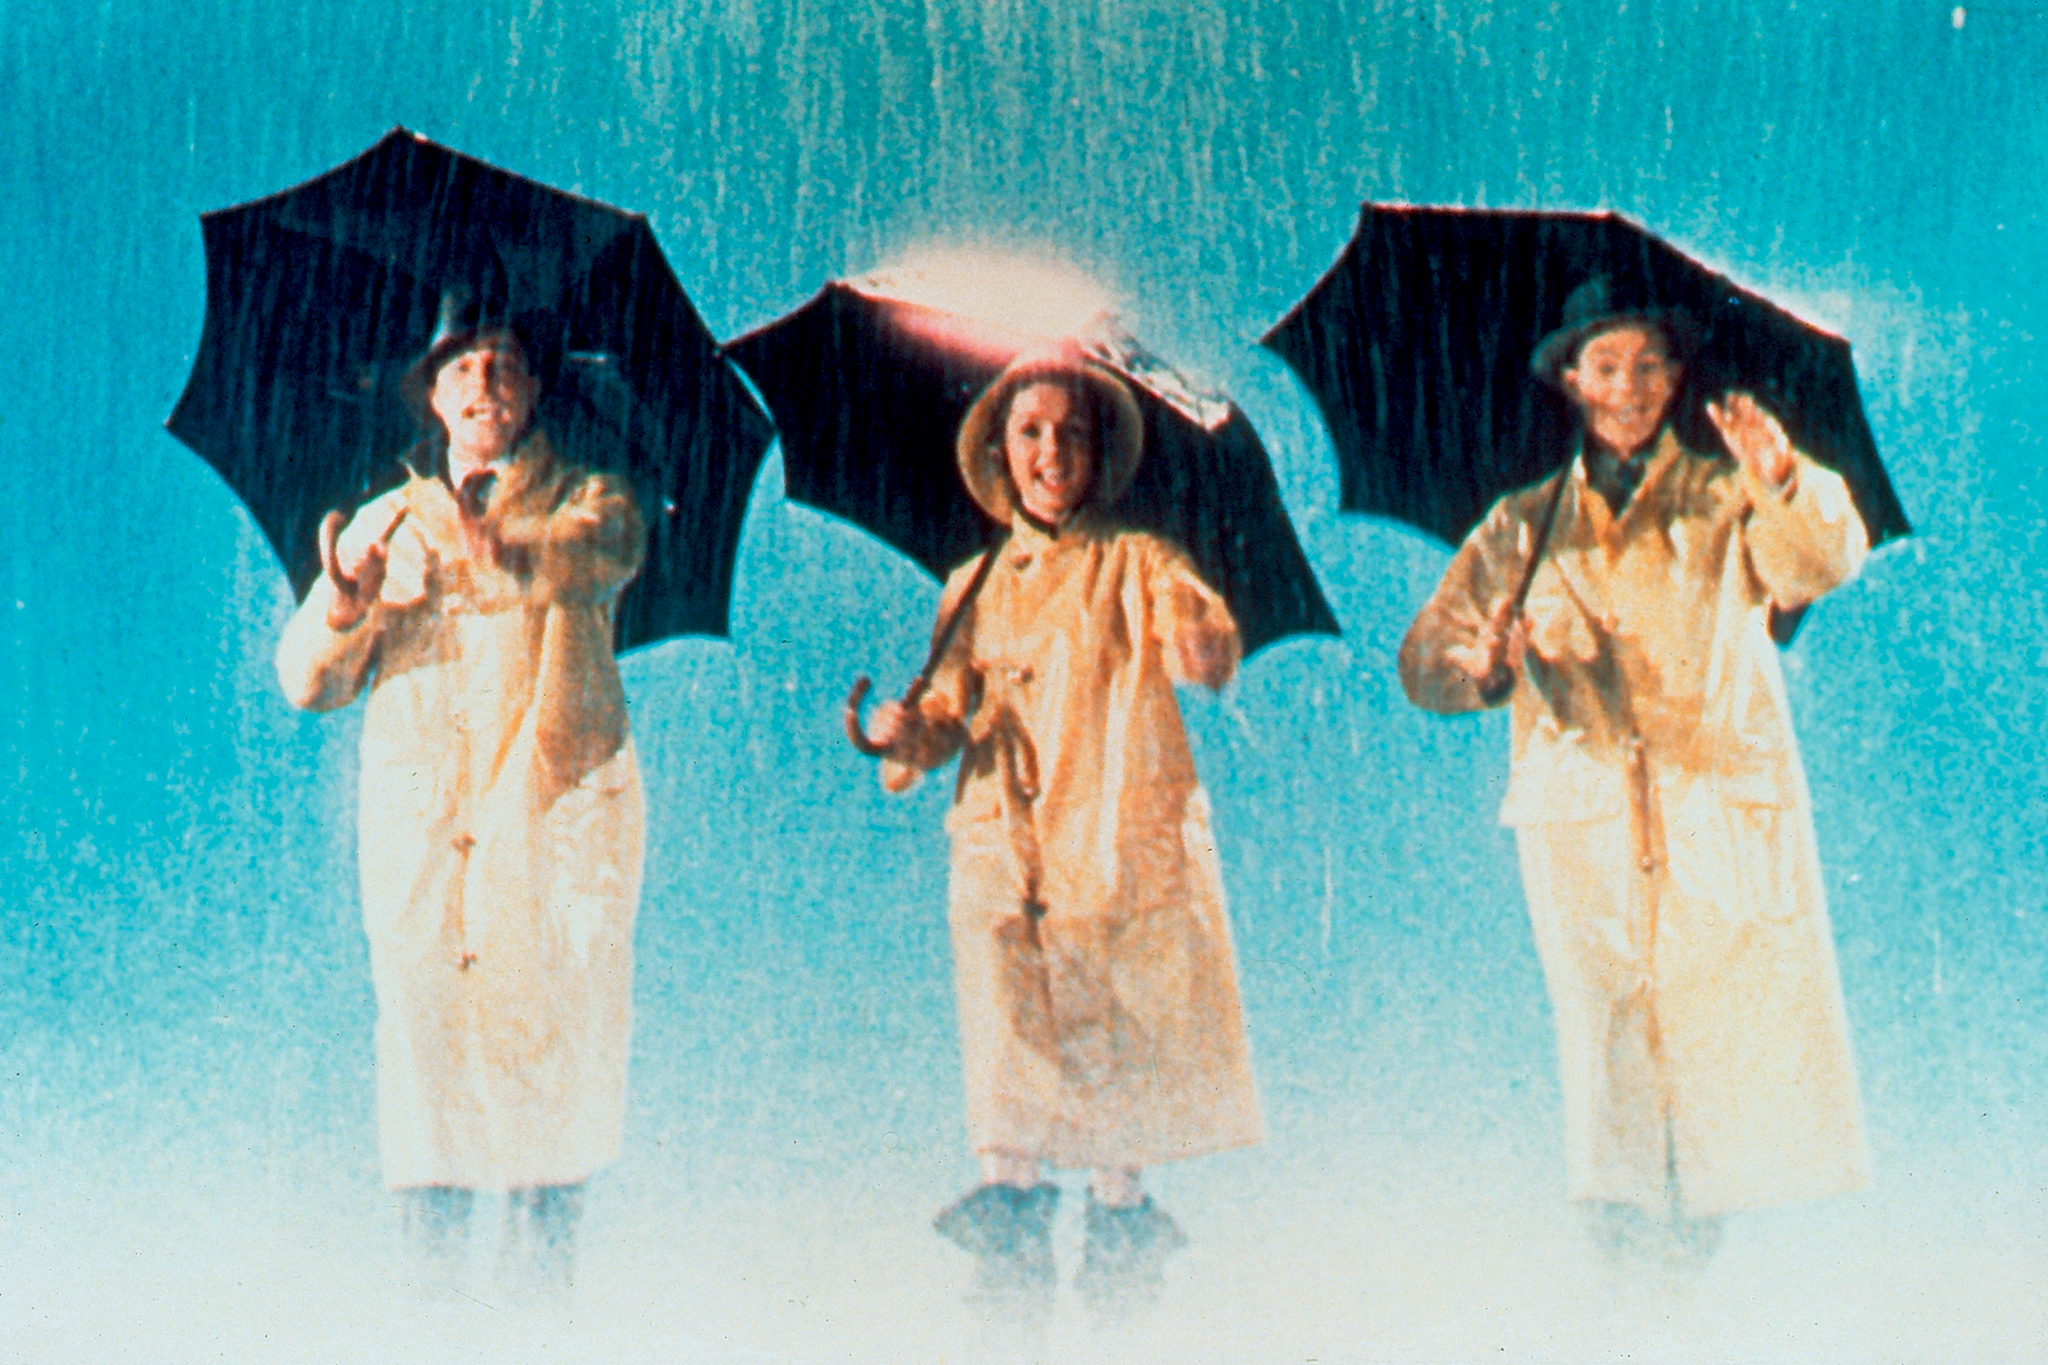 Singin' in the Rain (1962)